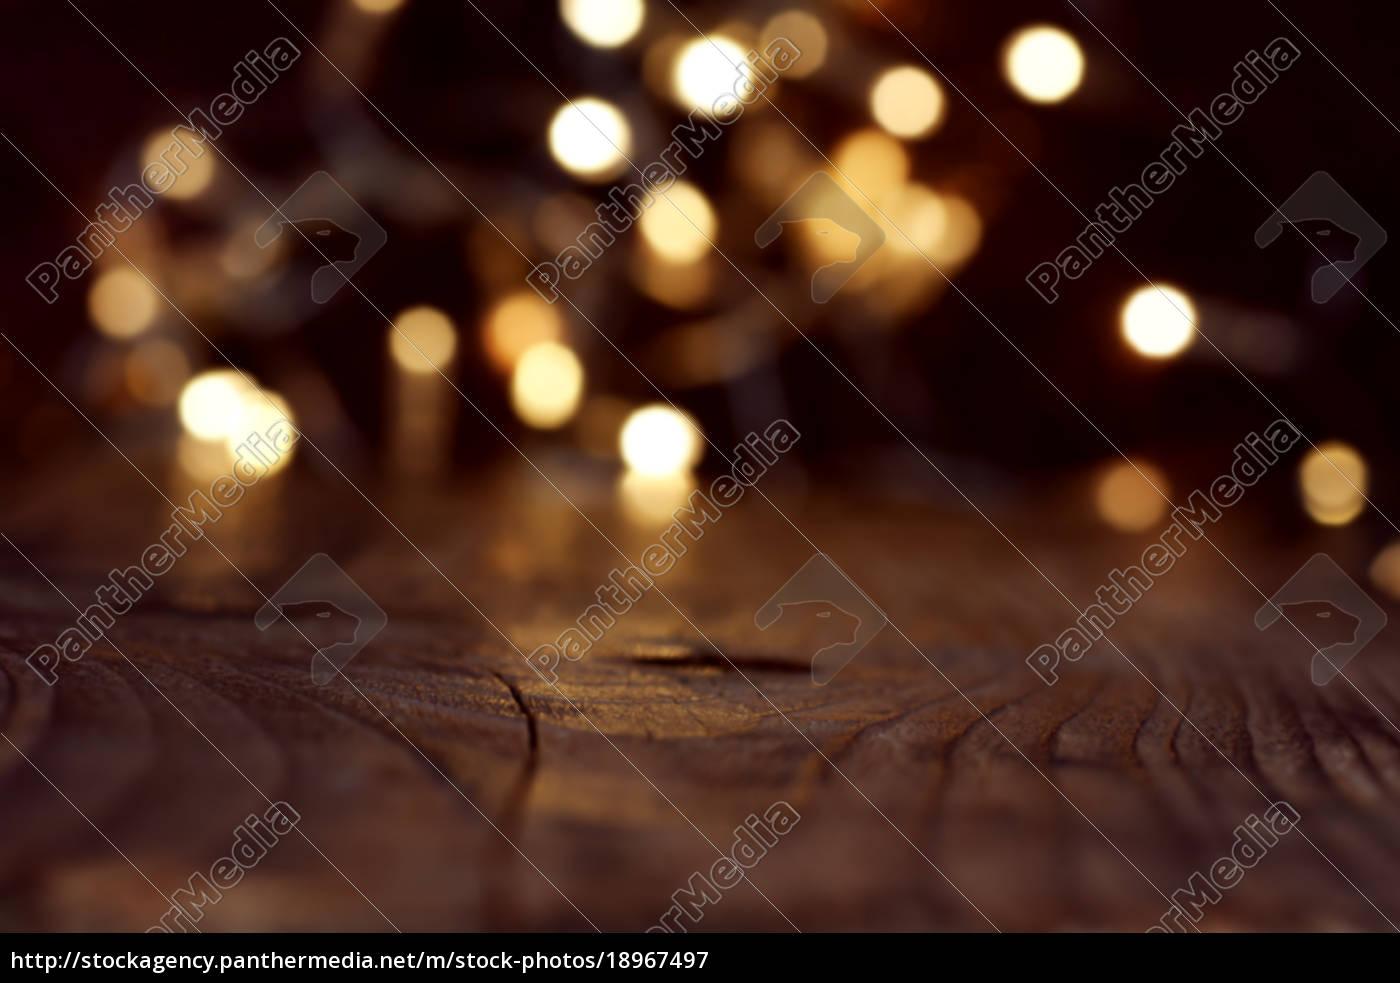 elegant, background, for, holidays - 18967497